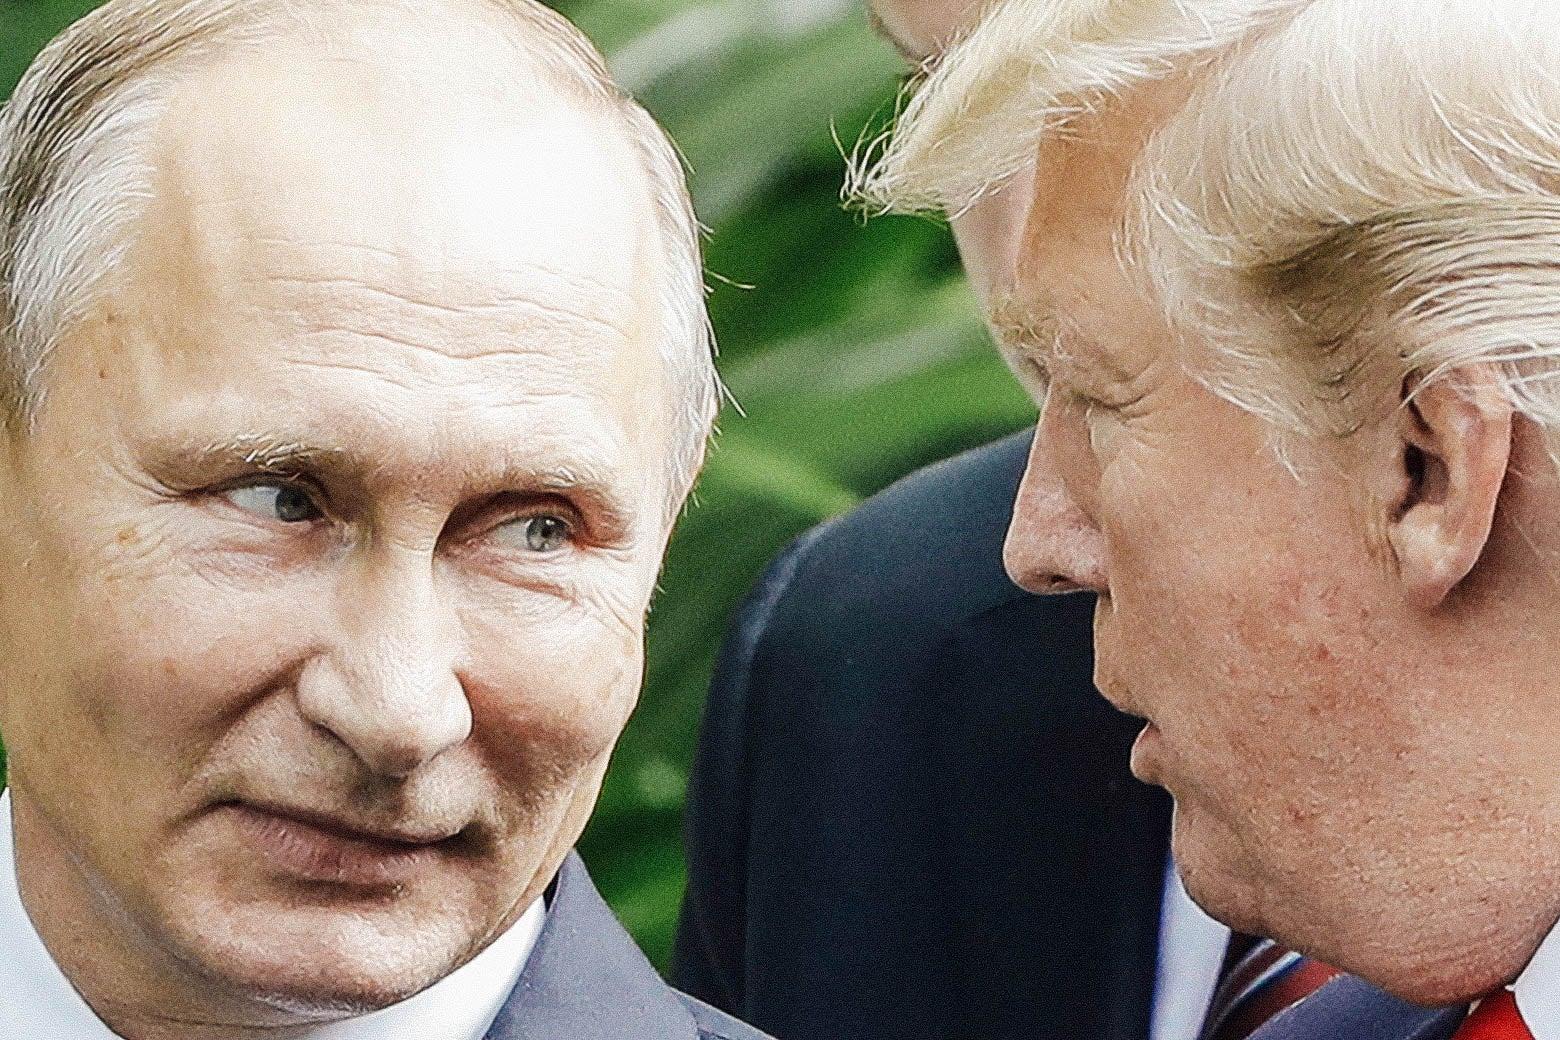 Vladimir Putin looks toward Donald Trump as they converse.